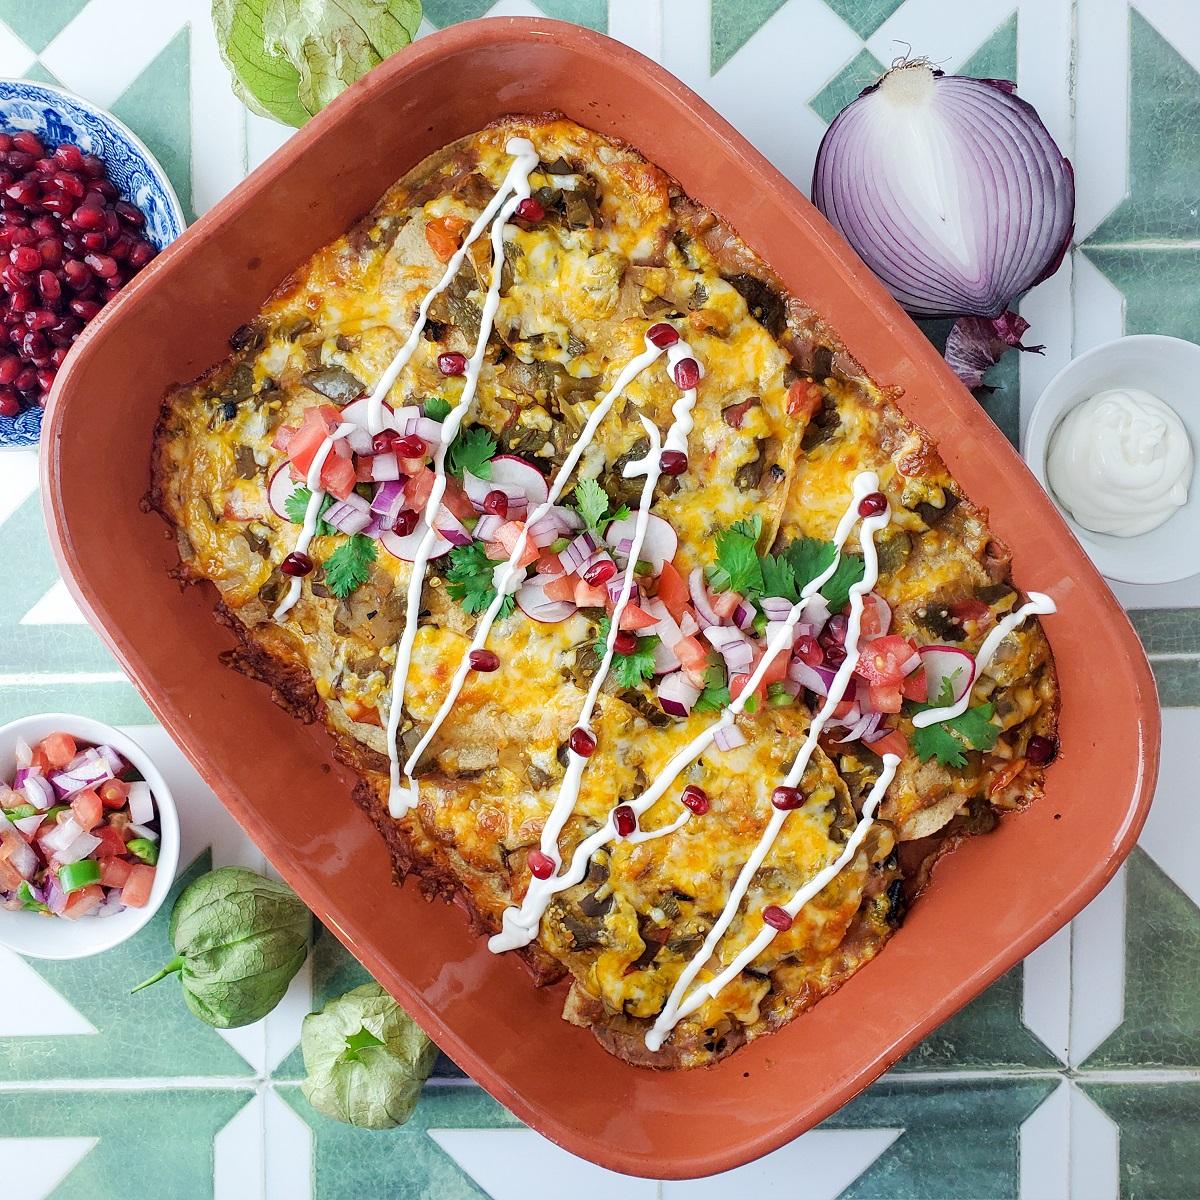 Hatch Chile Enchiladas